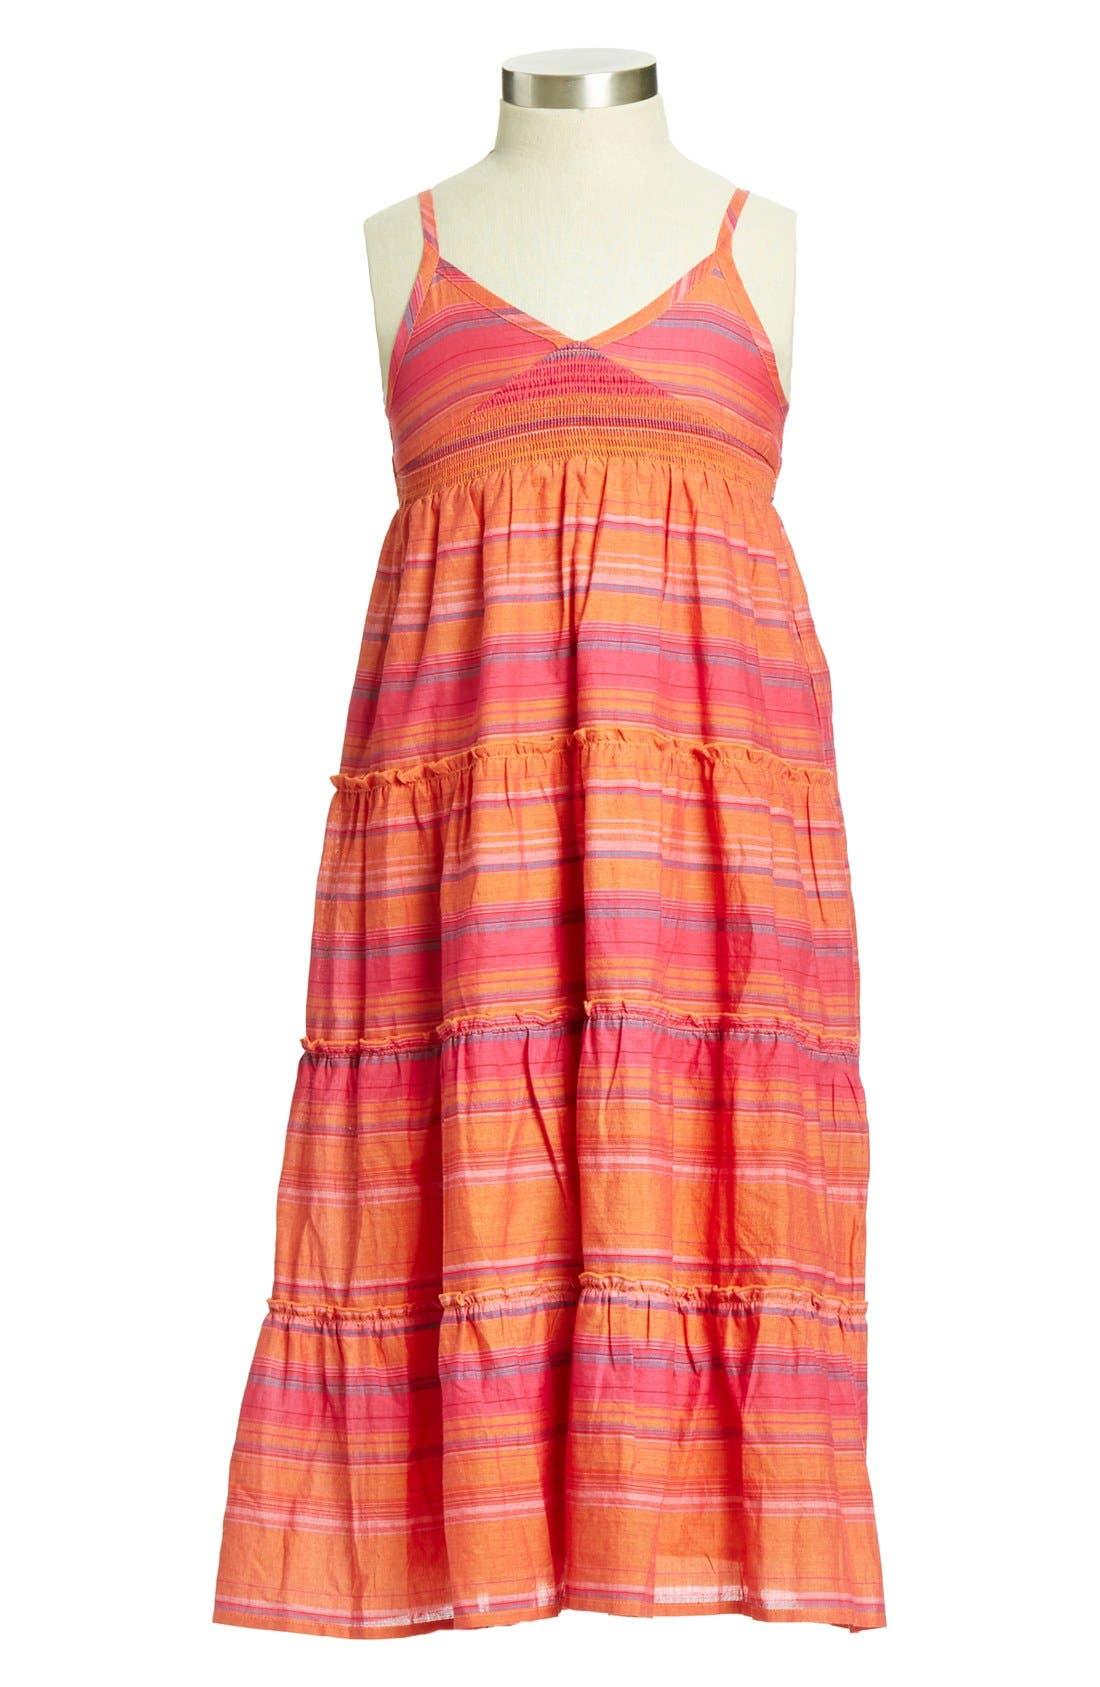 Alternate Image 1 Selected - Peek 'Marigold' Cotton Dress (Toddler Girls, Little Girls & Big Girls)